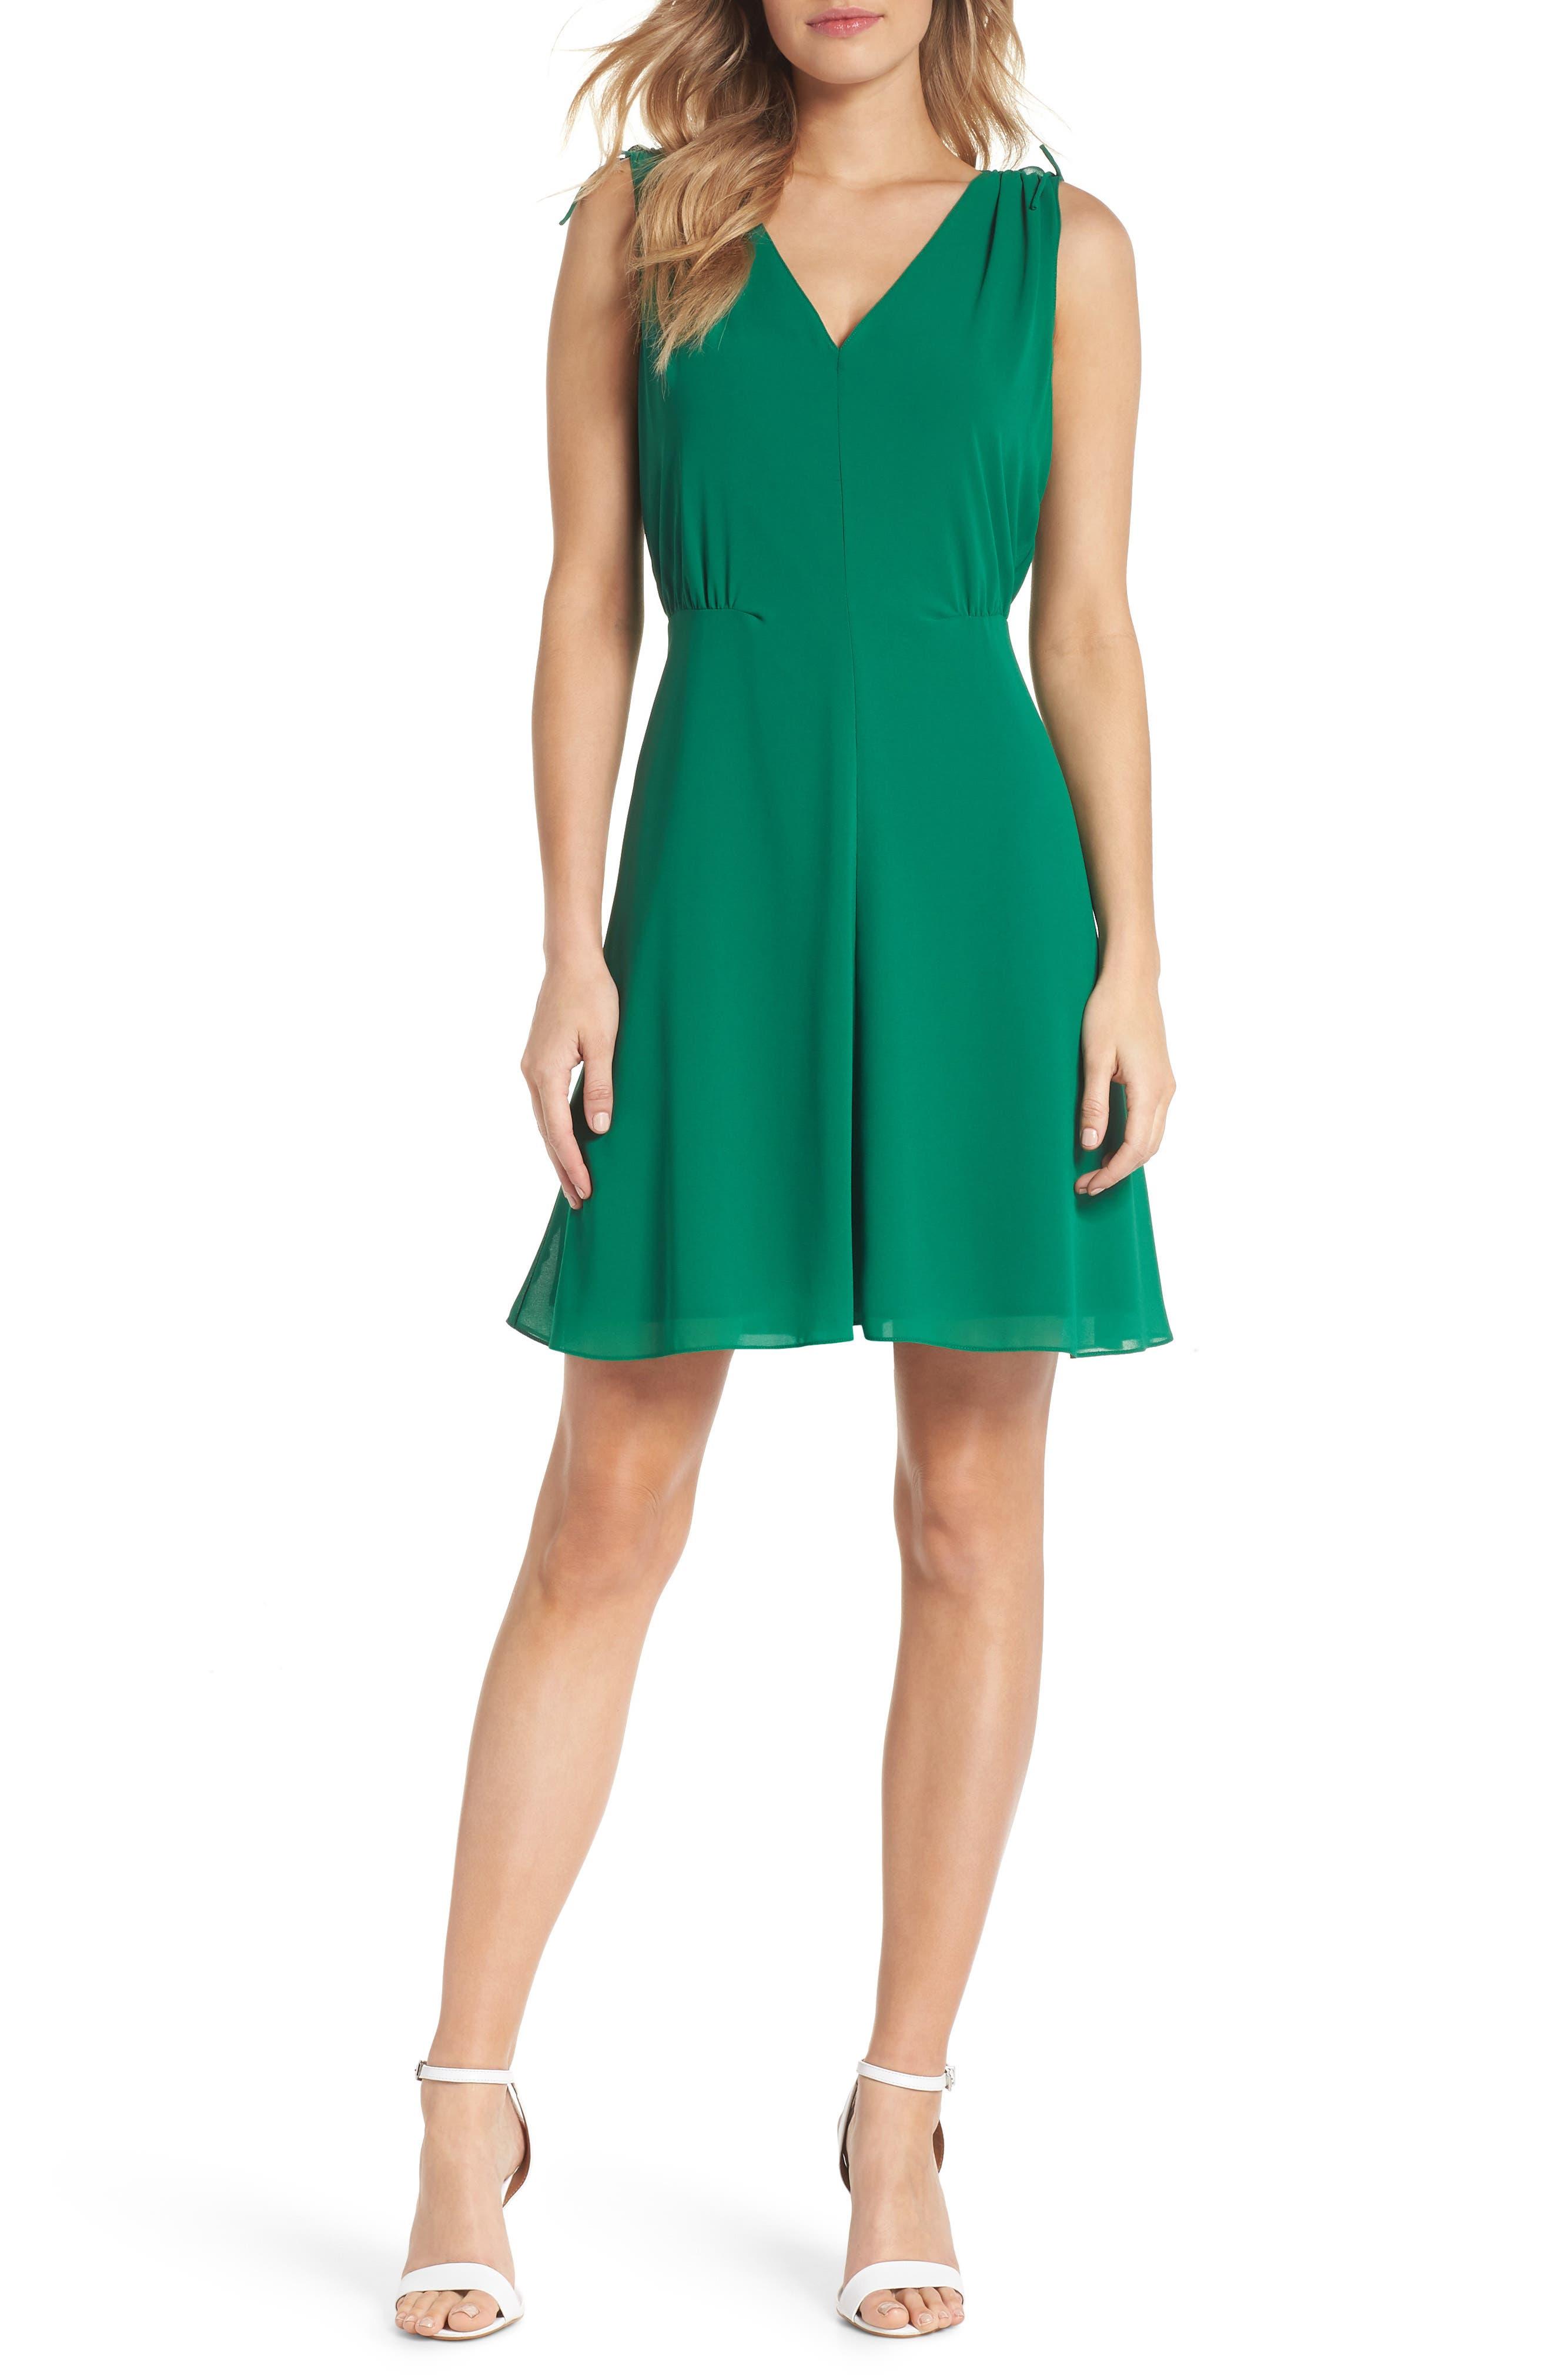 Soufflé V-Neck Chiffon Dress,                         Main,                         color, 310